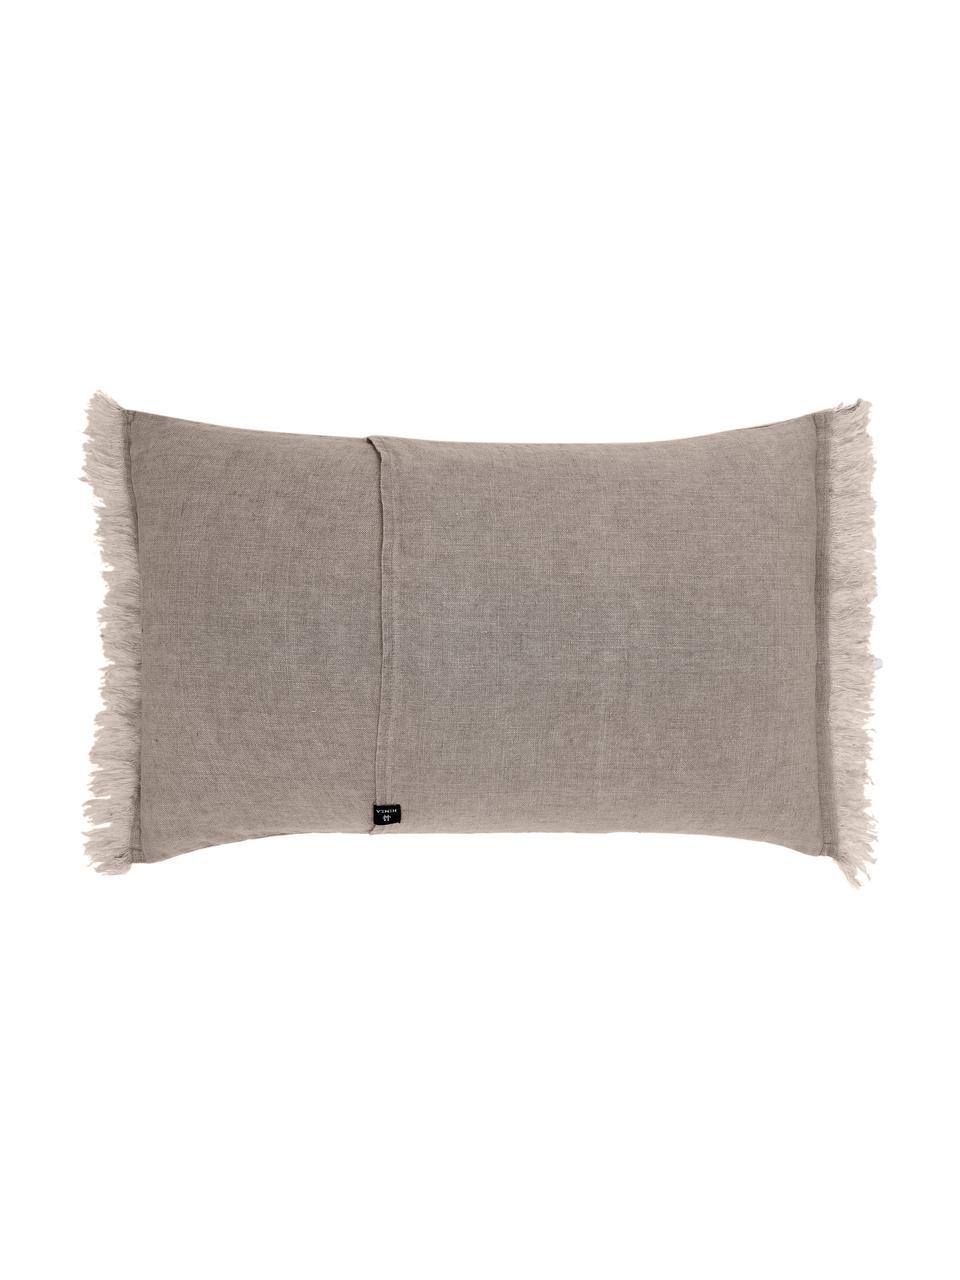 Federa arredo in lino con frange Levelin, Beige, Larg. 40 x Lung. 60 cm